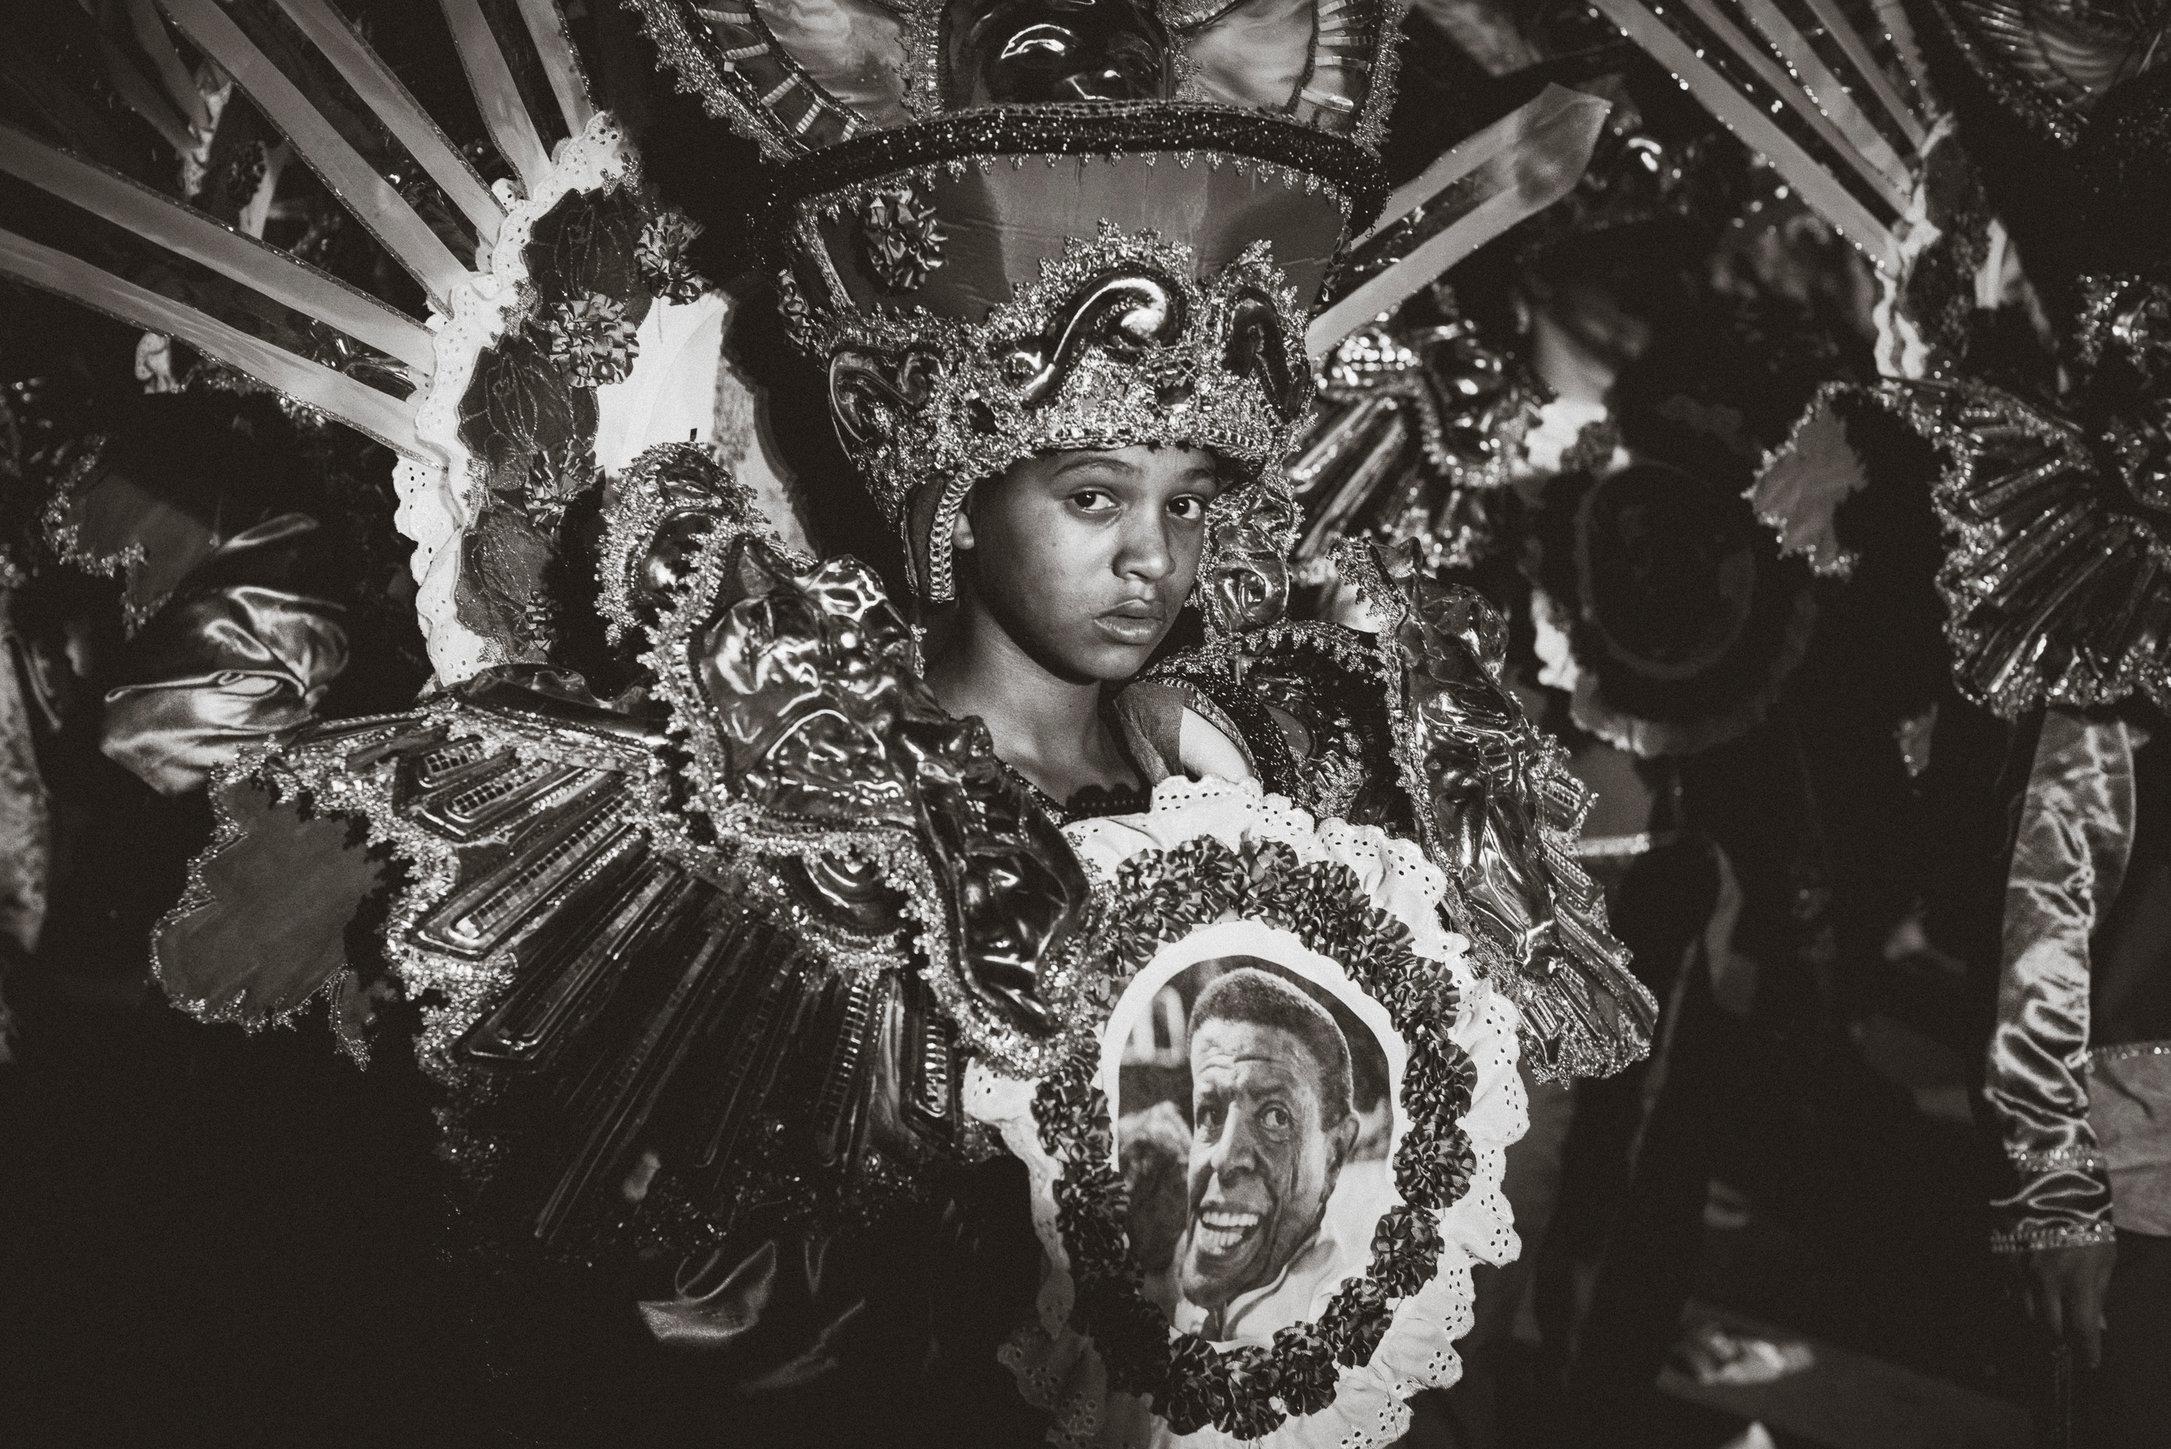 20180211-Carnaval-92.jpg